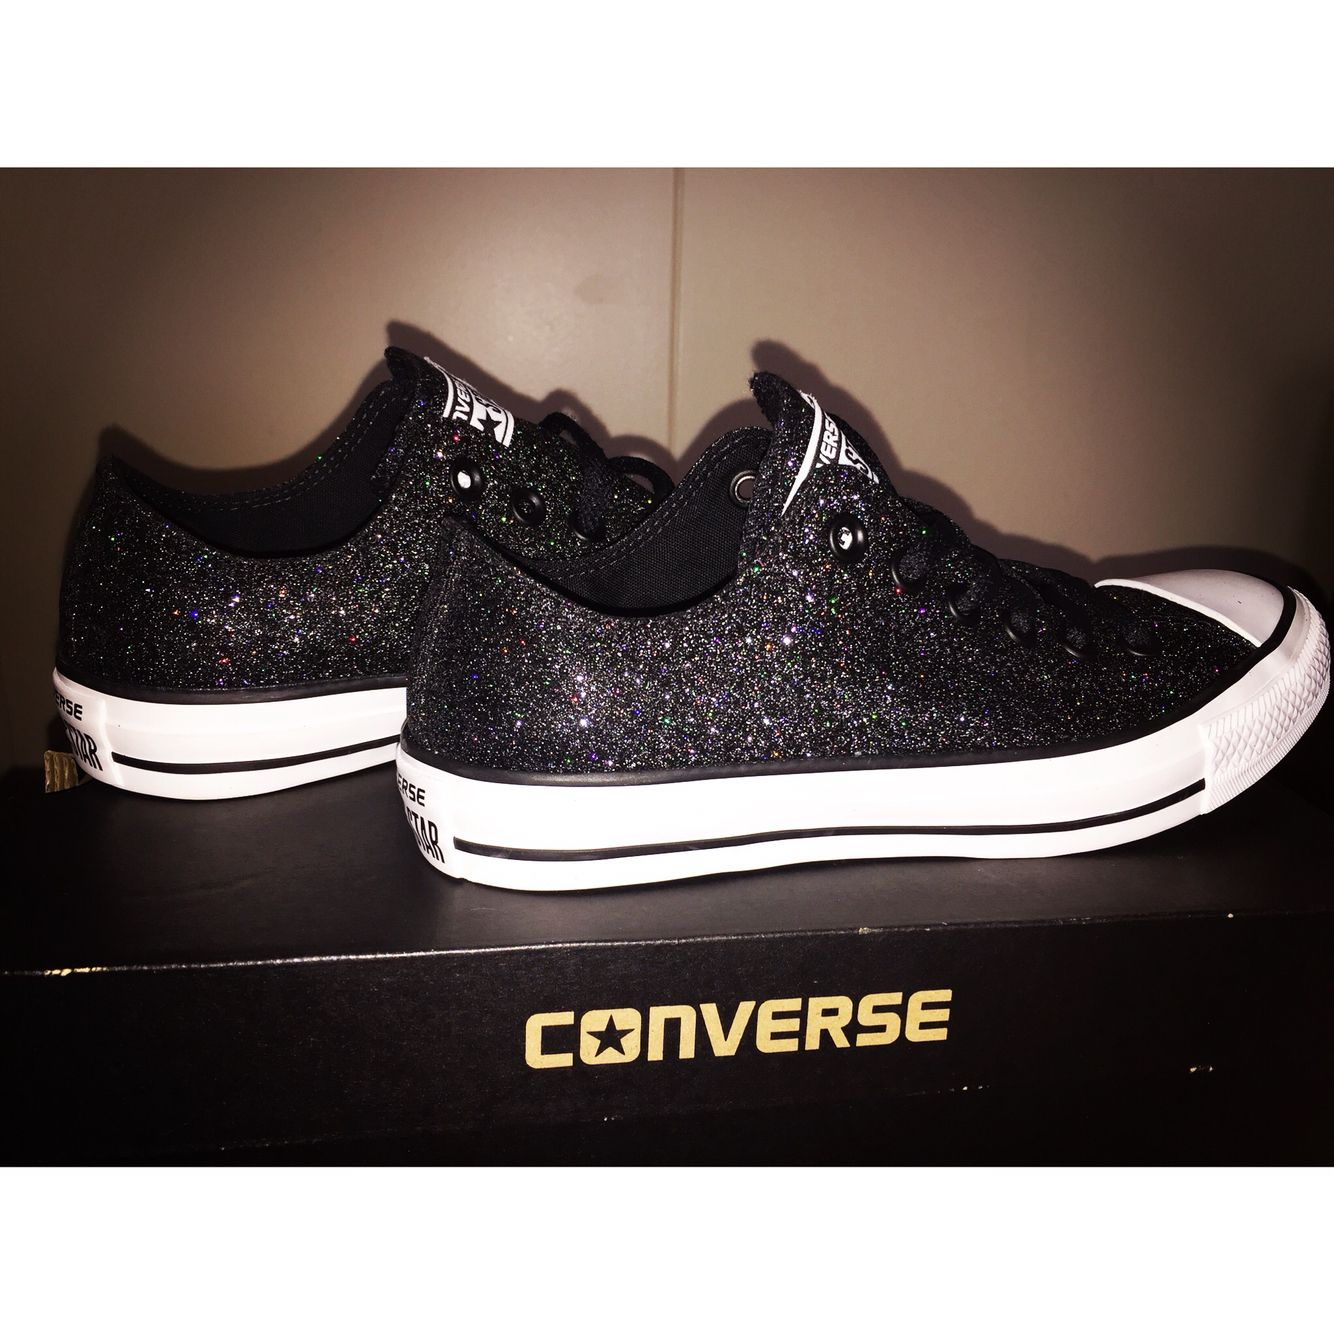 aa6bac294c2 Black sparkly Converse